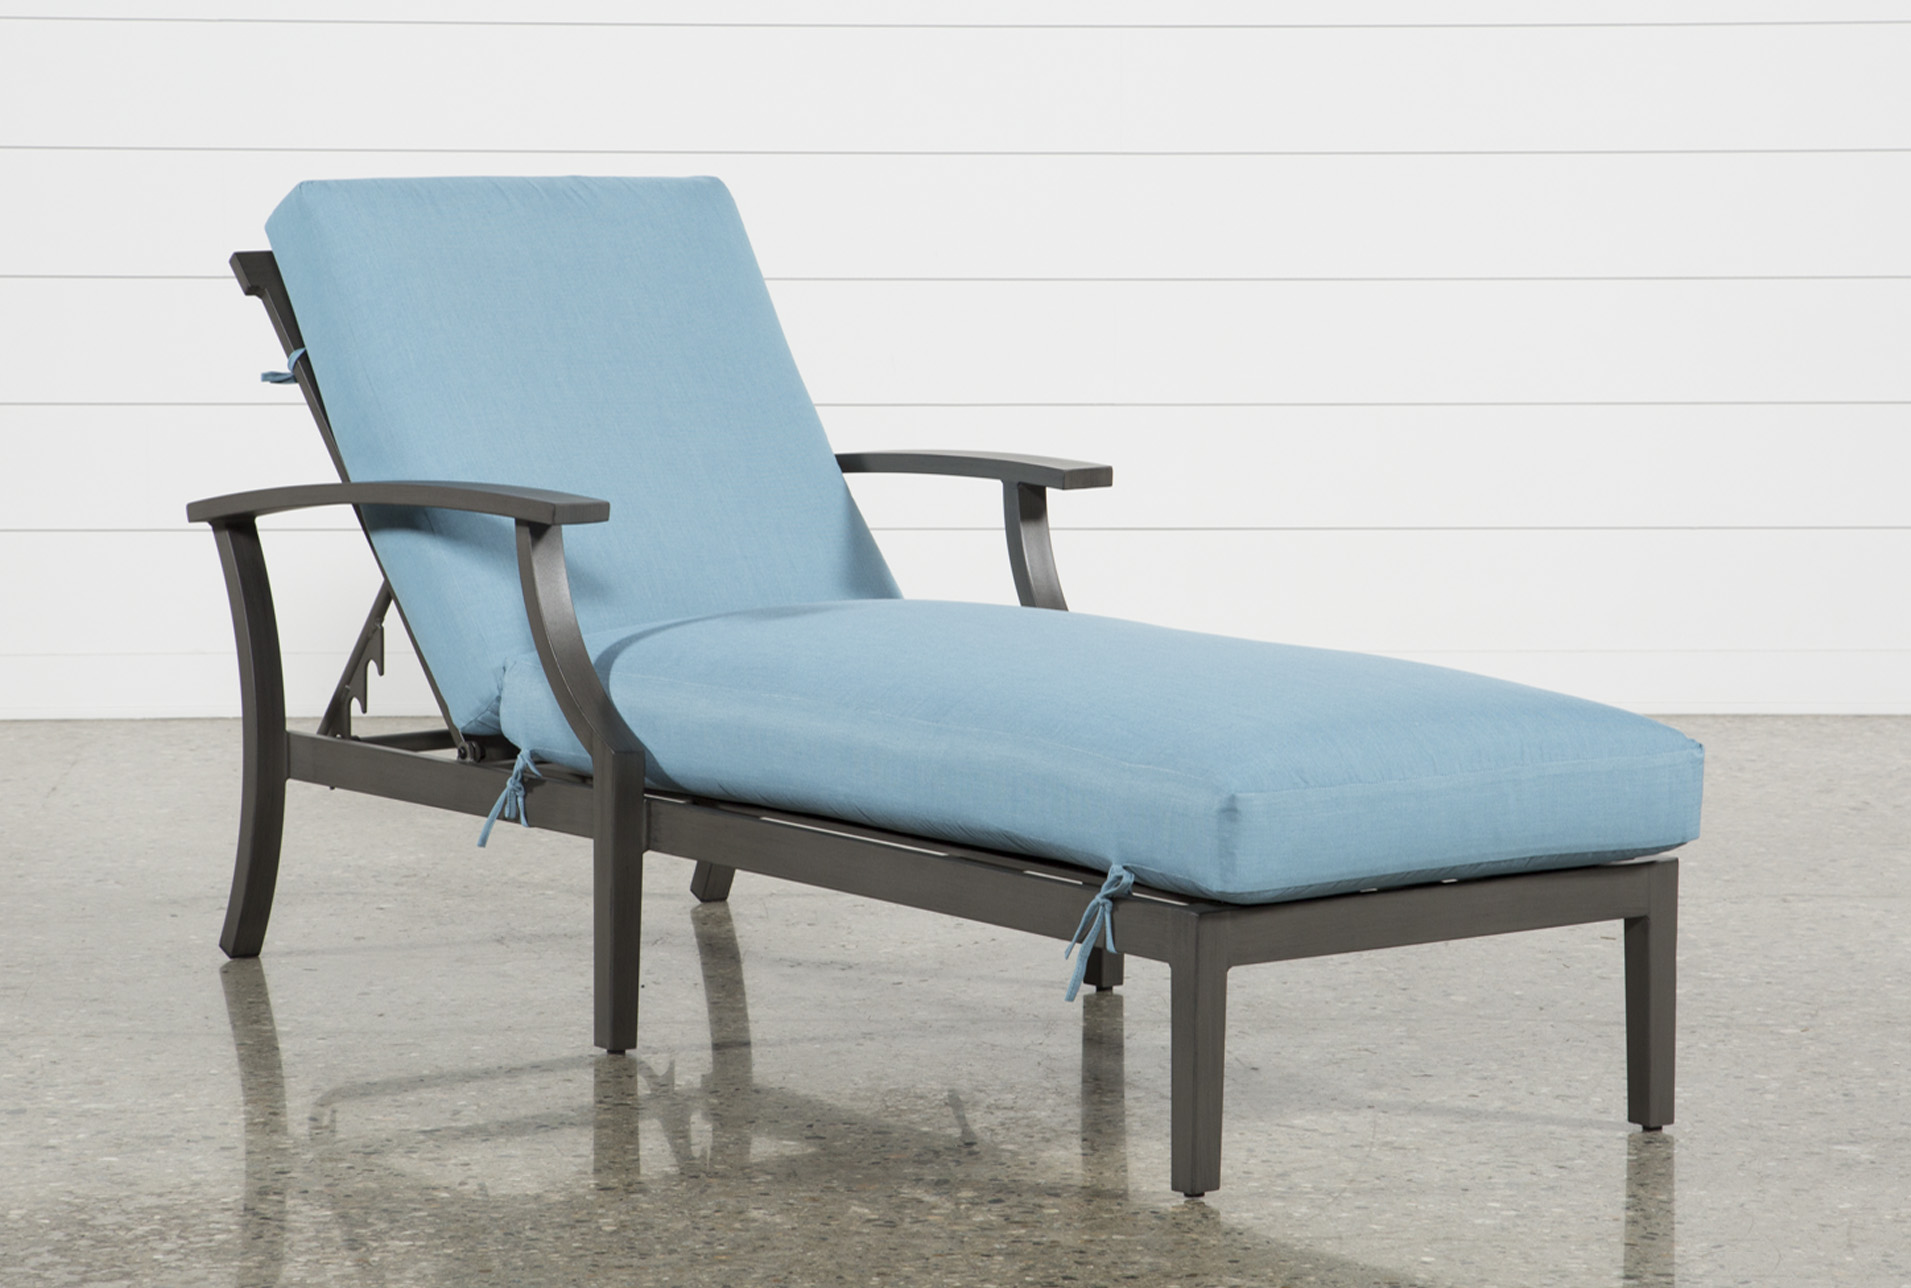 Outdoor Martinique II Aqua Chaise Lounge